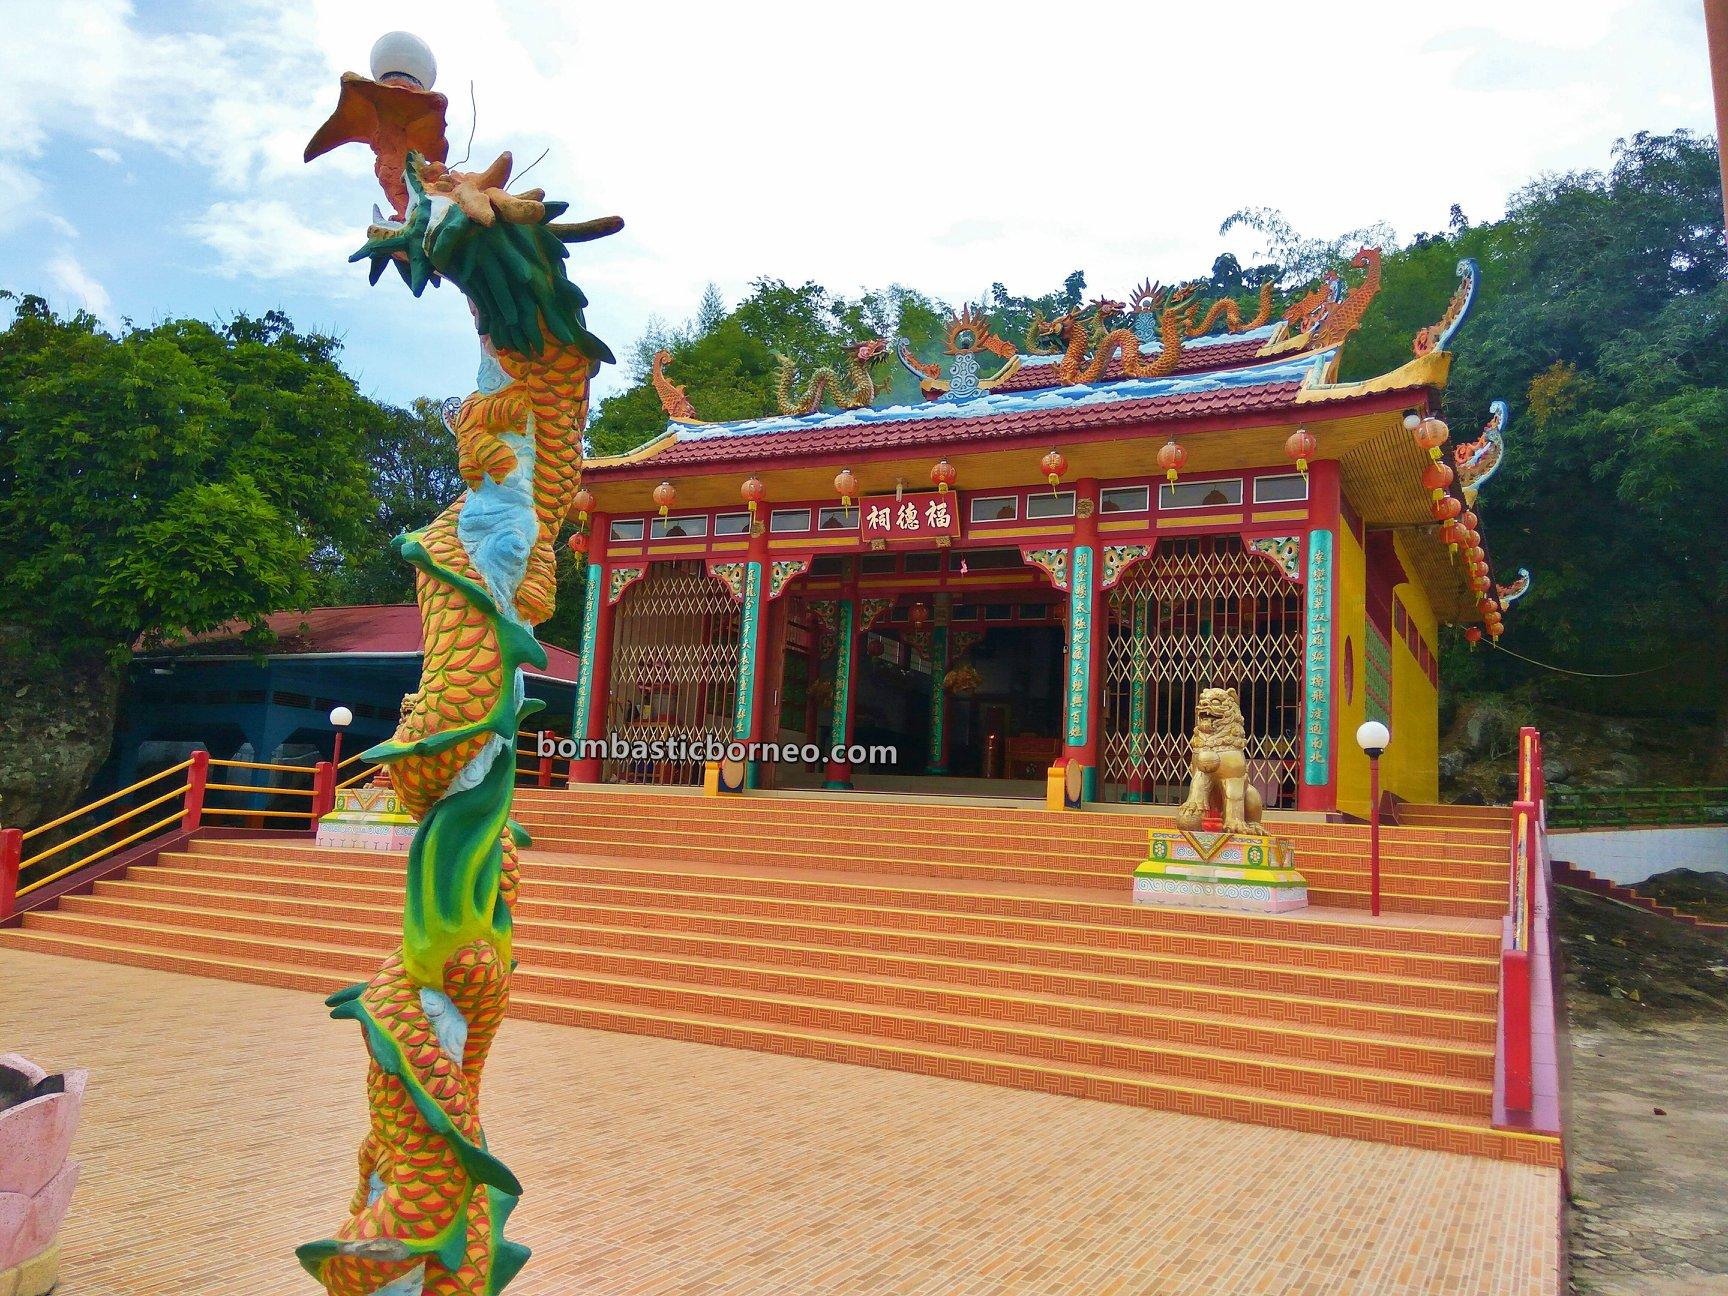 Guan Yin temple, village, Indonesia, Kalimantan Barat, Obyek wisata, tourist attraction, travel guide, Trans Borneo, 跨境婆罗洲游踪, 印尼西加里曼丹, 三发邦戛庙